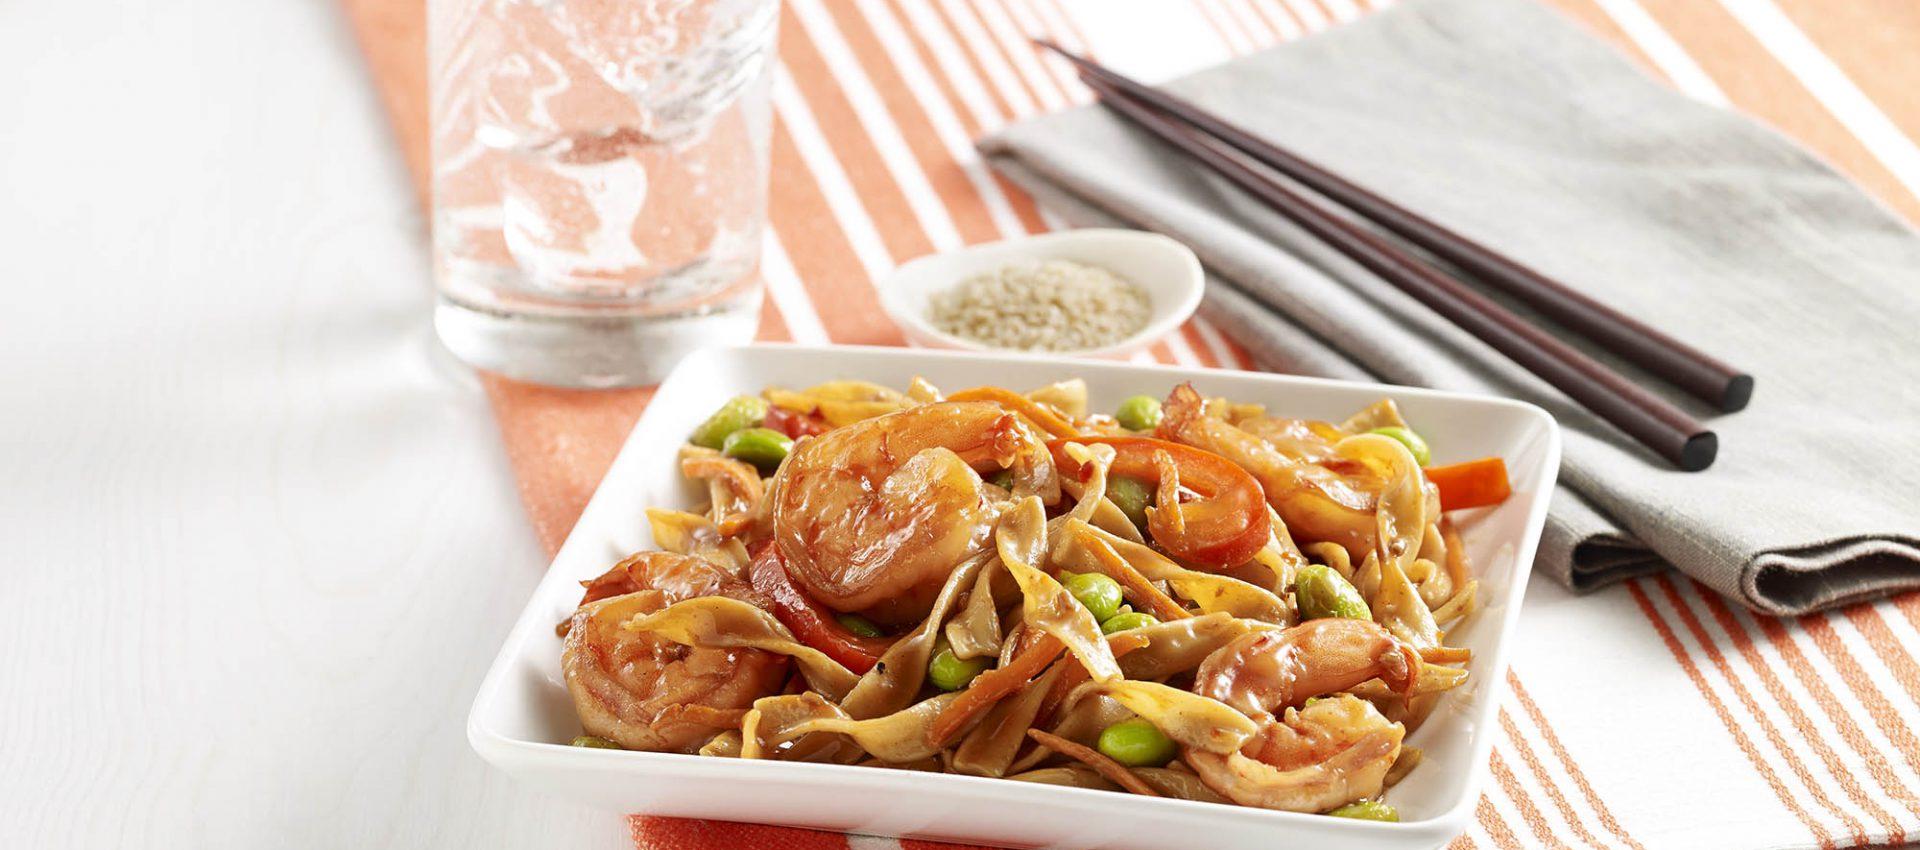 Pan-Fried-Noodles-with-Shrimp-1920x850 Pan Fried Noodles with Shrimp